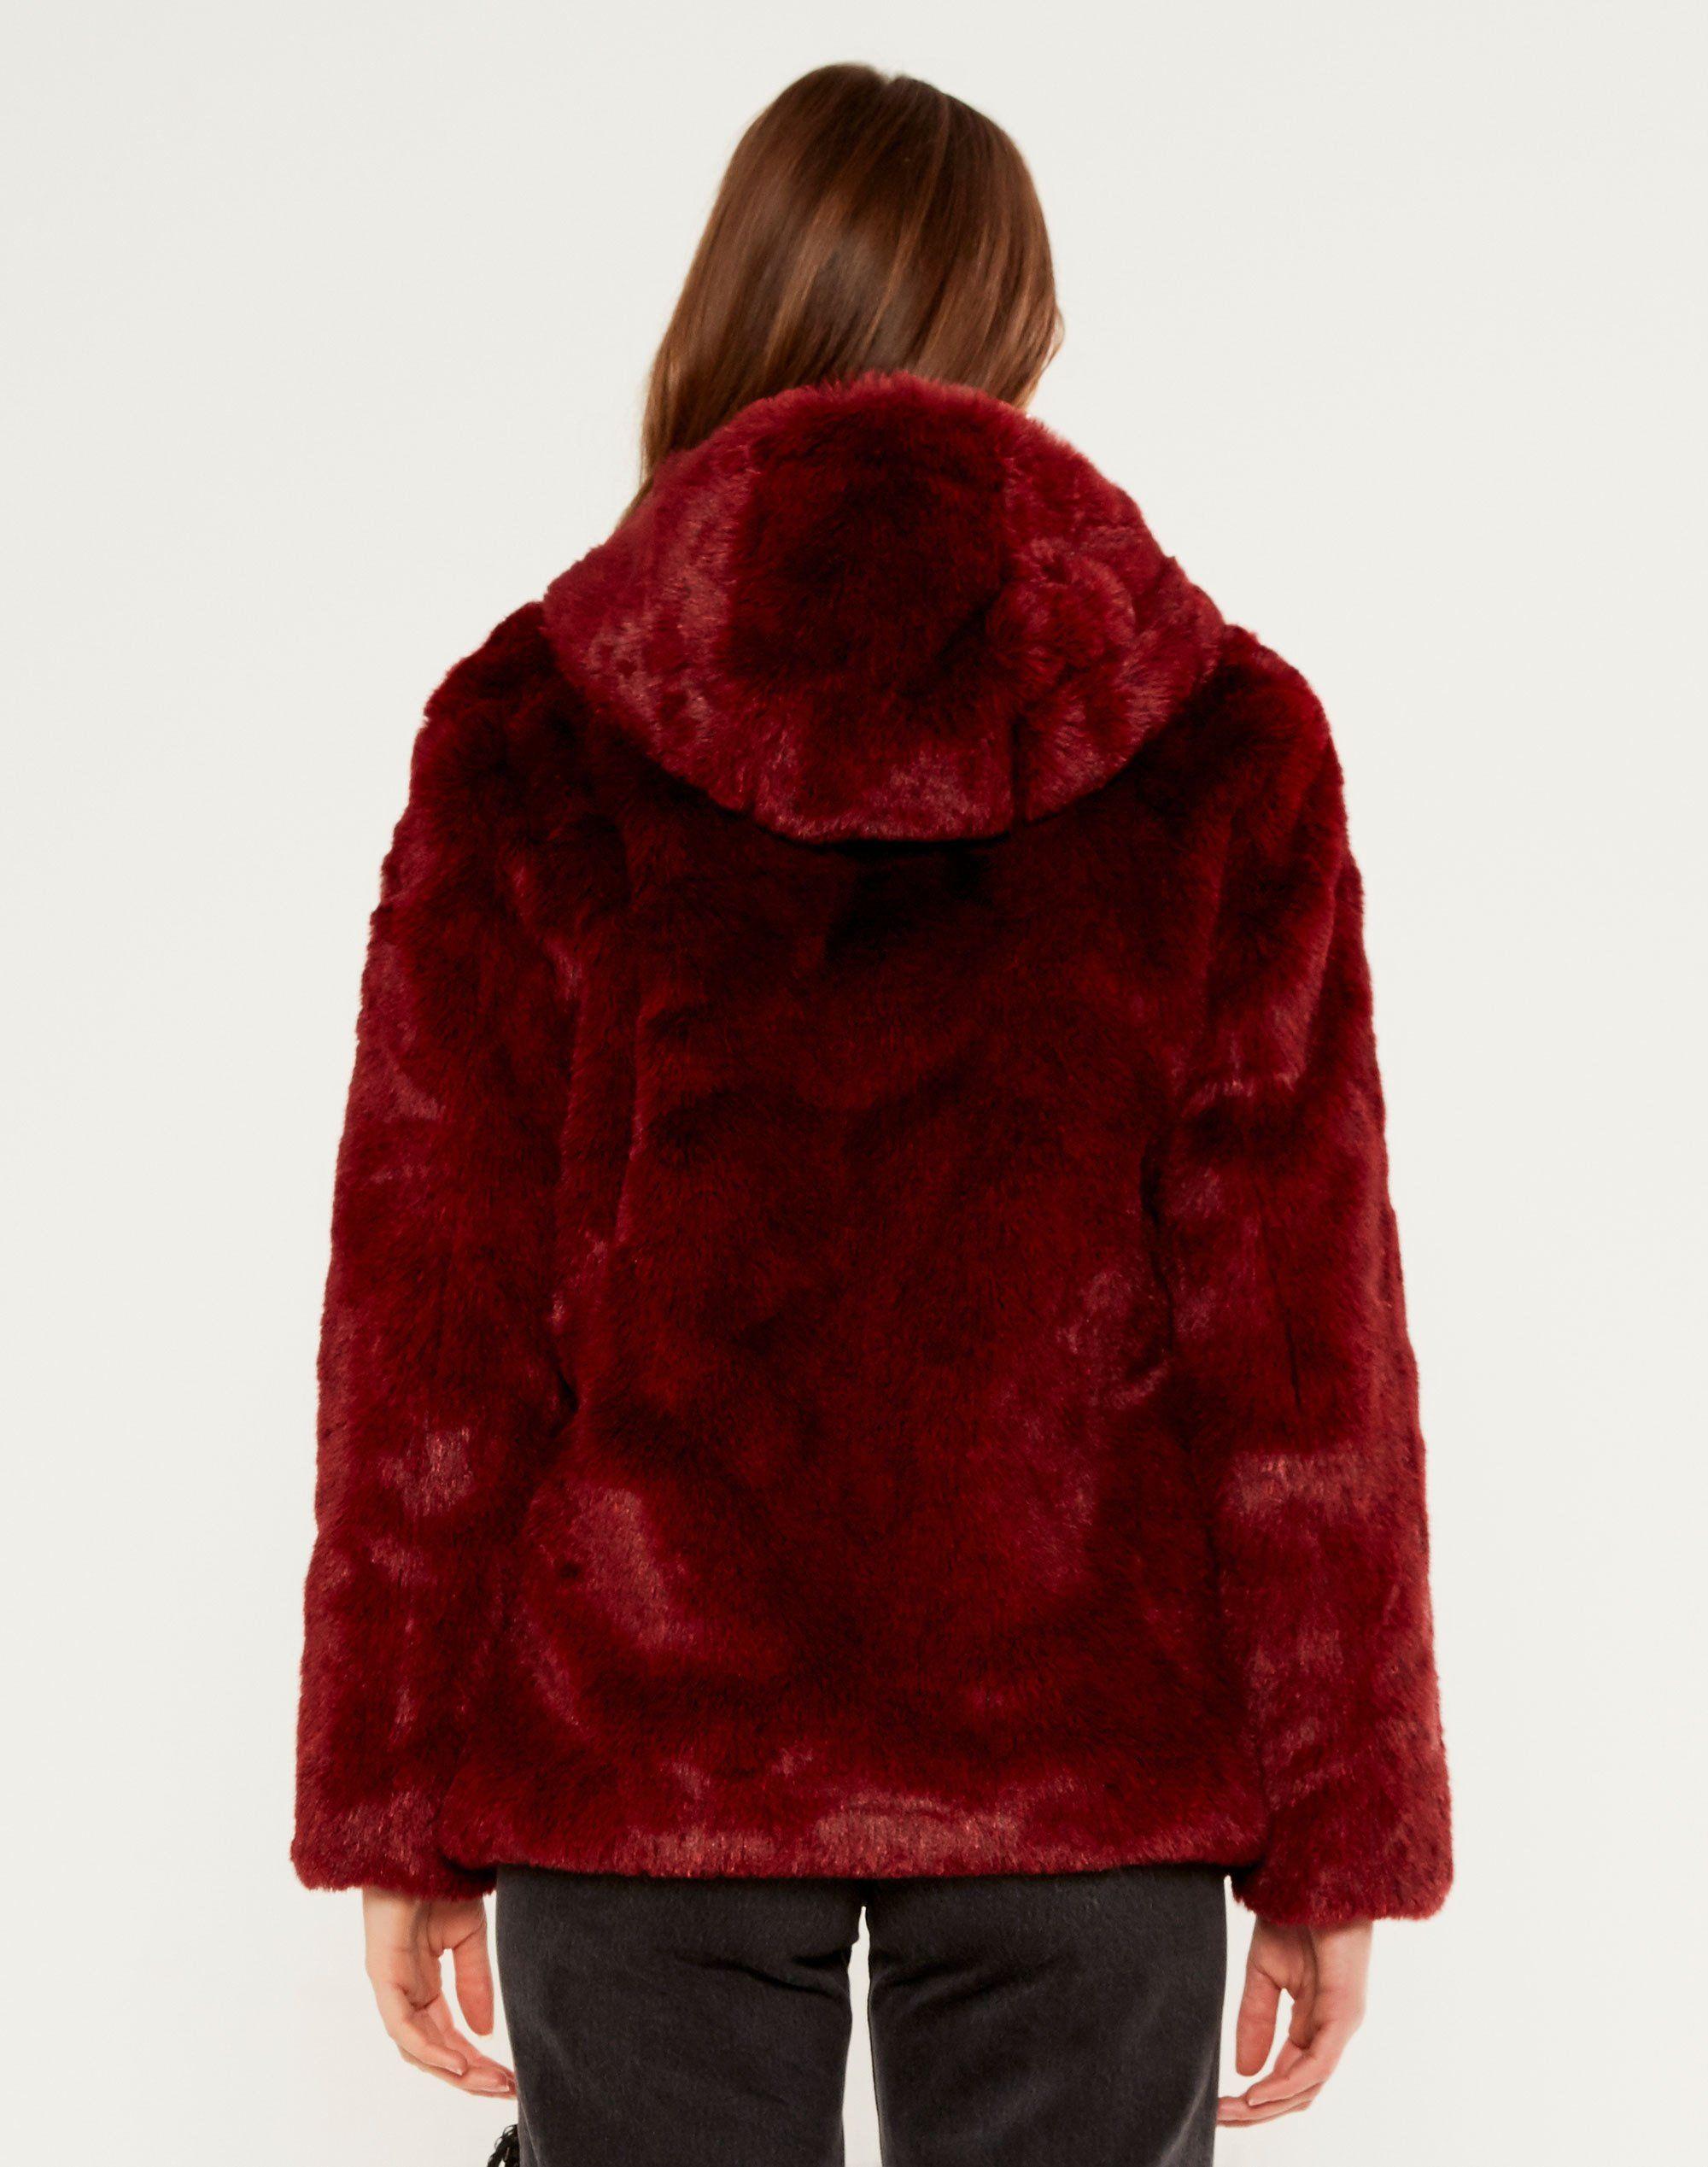 Hooded Faux Fur Coat Mars Red Coat Faux Fur Hooded Coat Winter Coats Women [ 2537 x 2000 Pixel ]